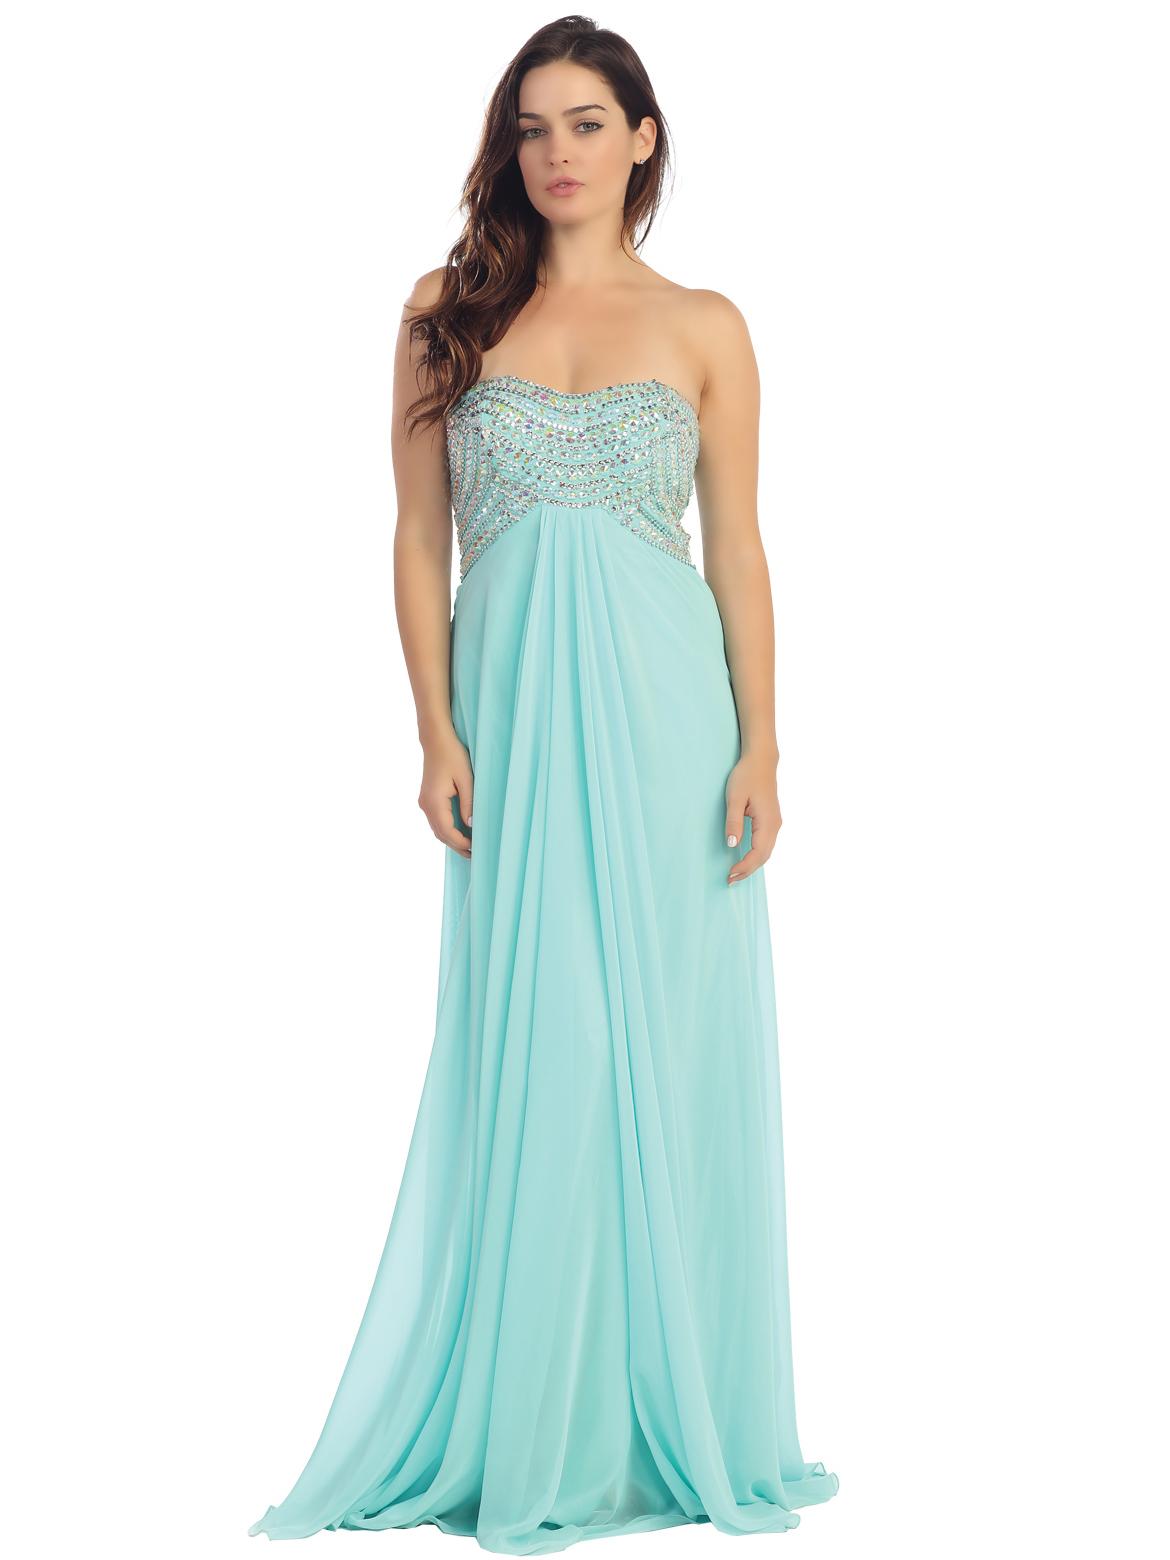 Empire Waist Strapless Embellished Bodice Prom Dress | Sung ...